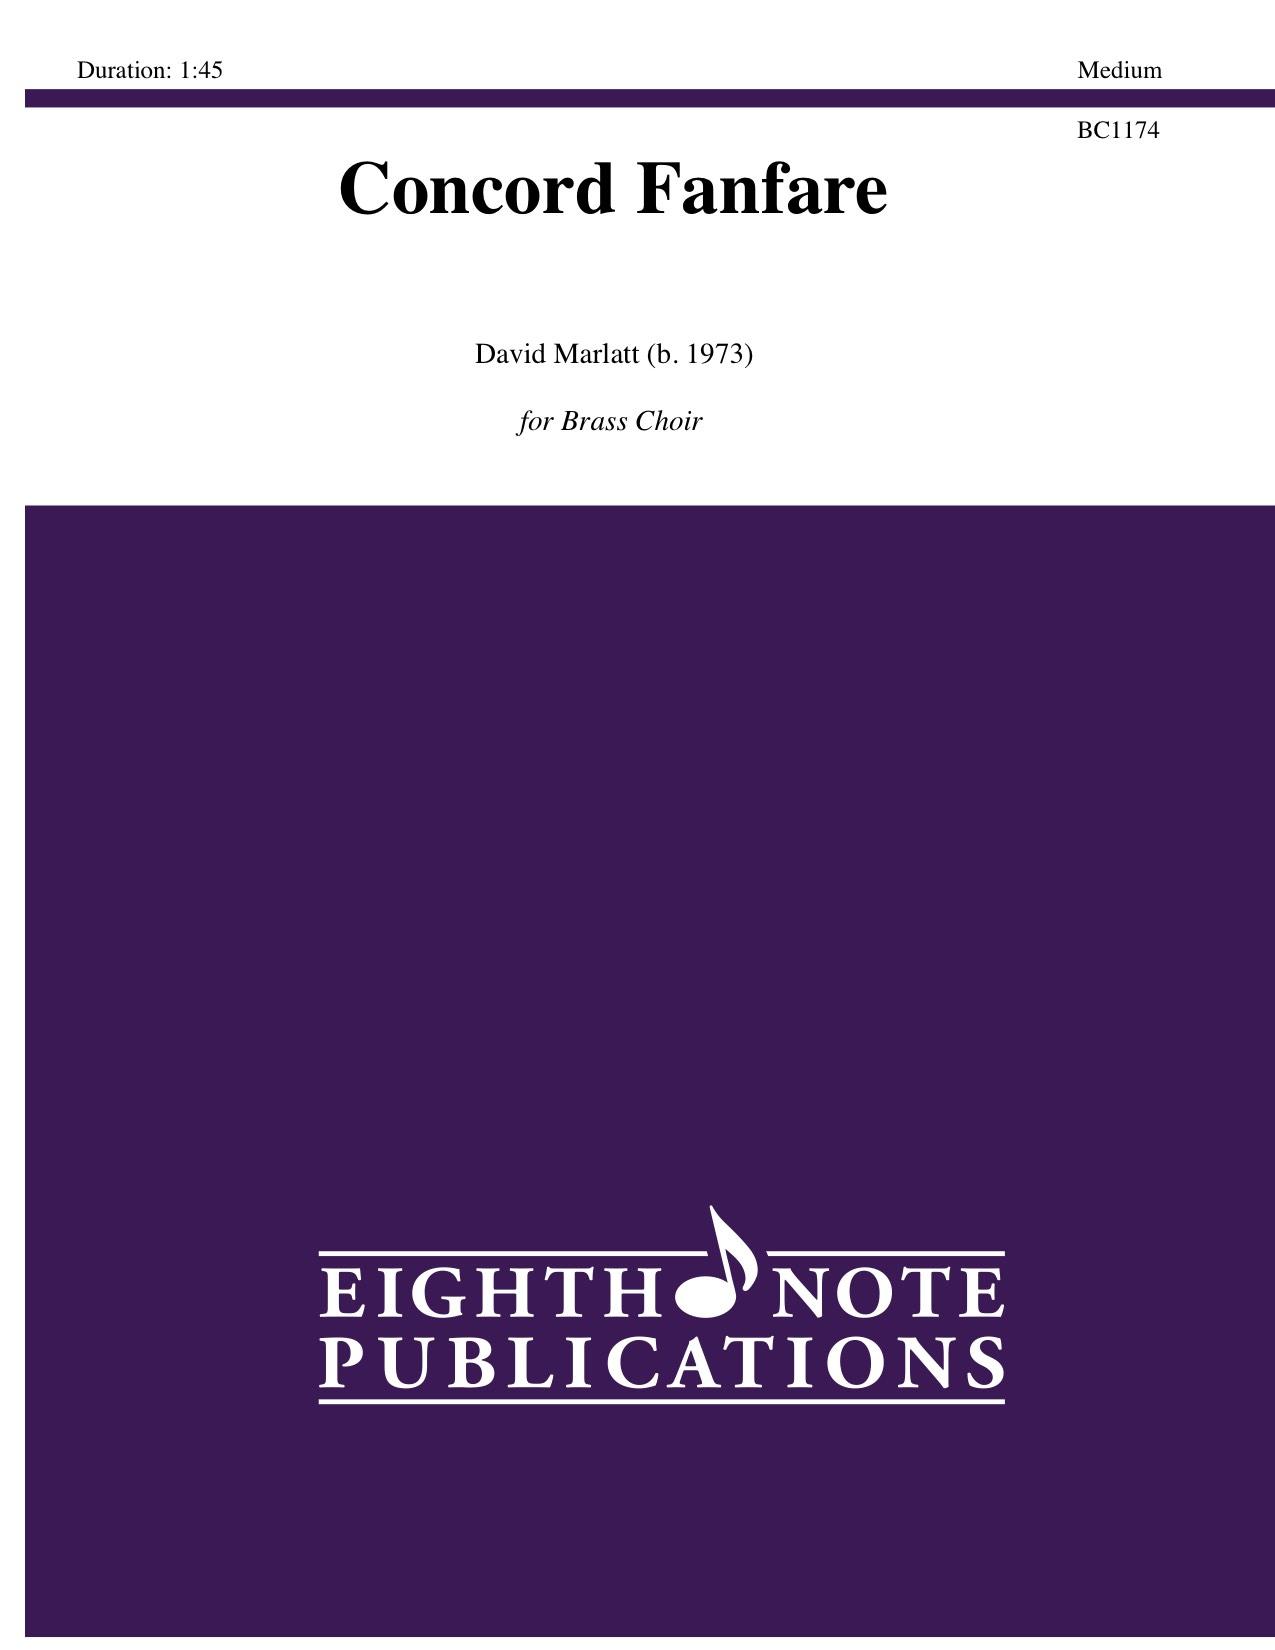 Concord Fanfare - David Marlatt